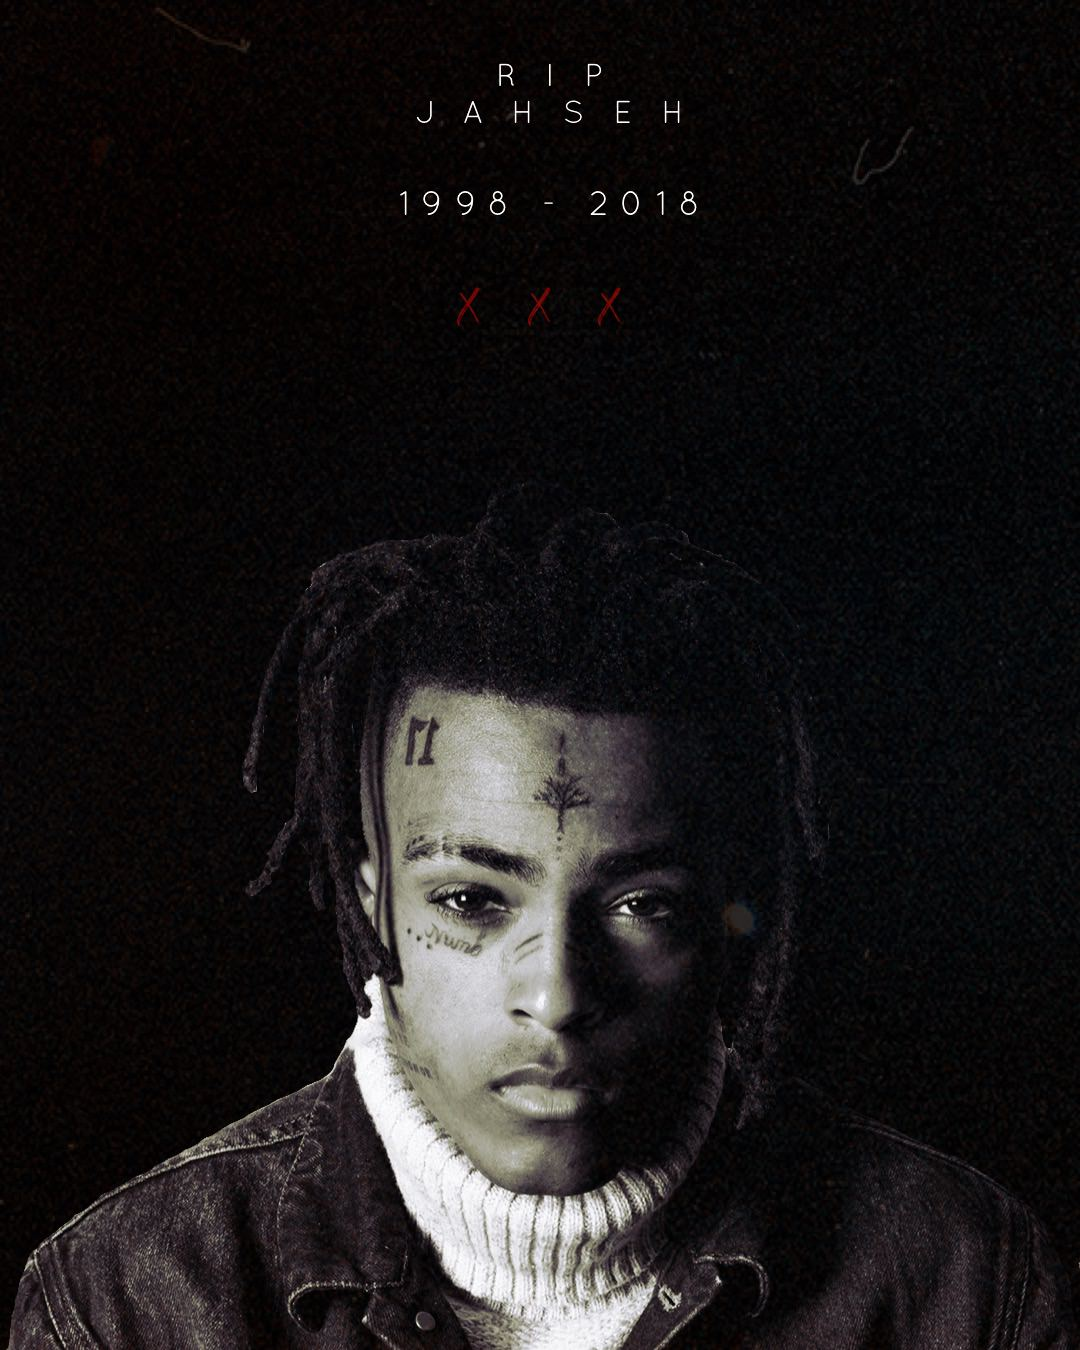 Rip XXXTentacion Wallpapers